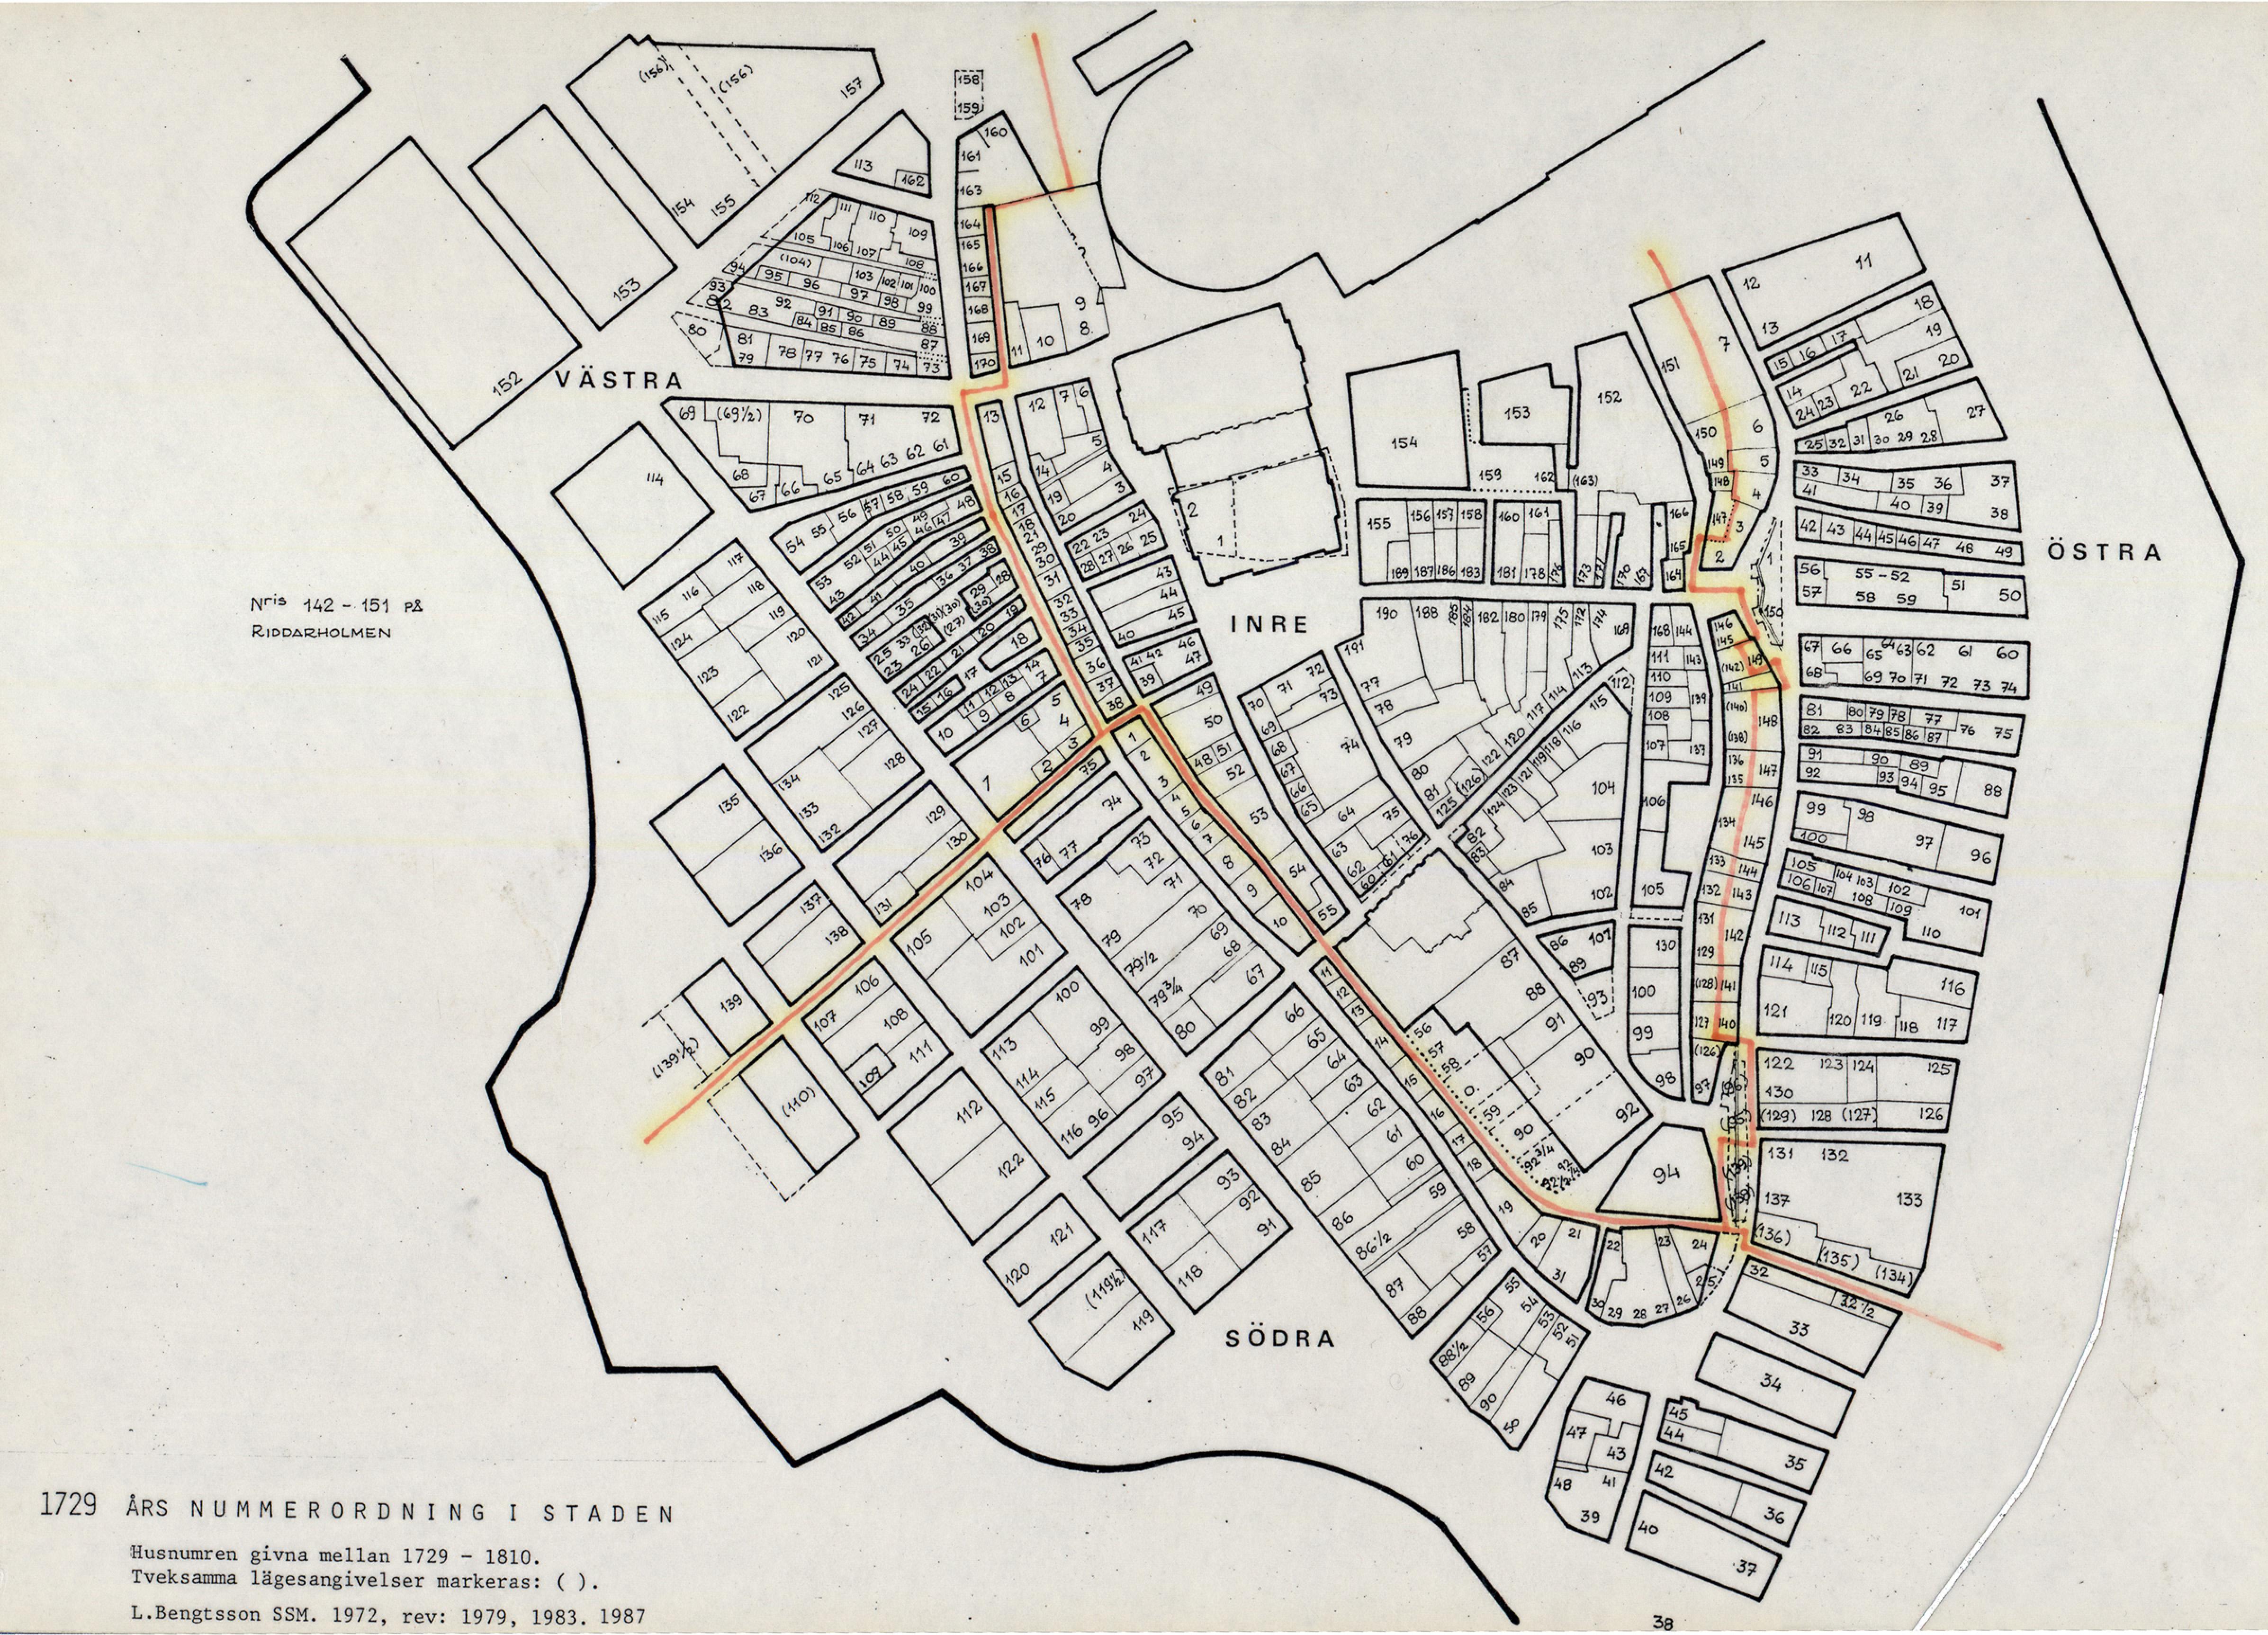 stockholm gamla stan karta Karta över Gamla stan 1729 års tomtnummer   Stockholmskällan stockholm gamla stan karta